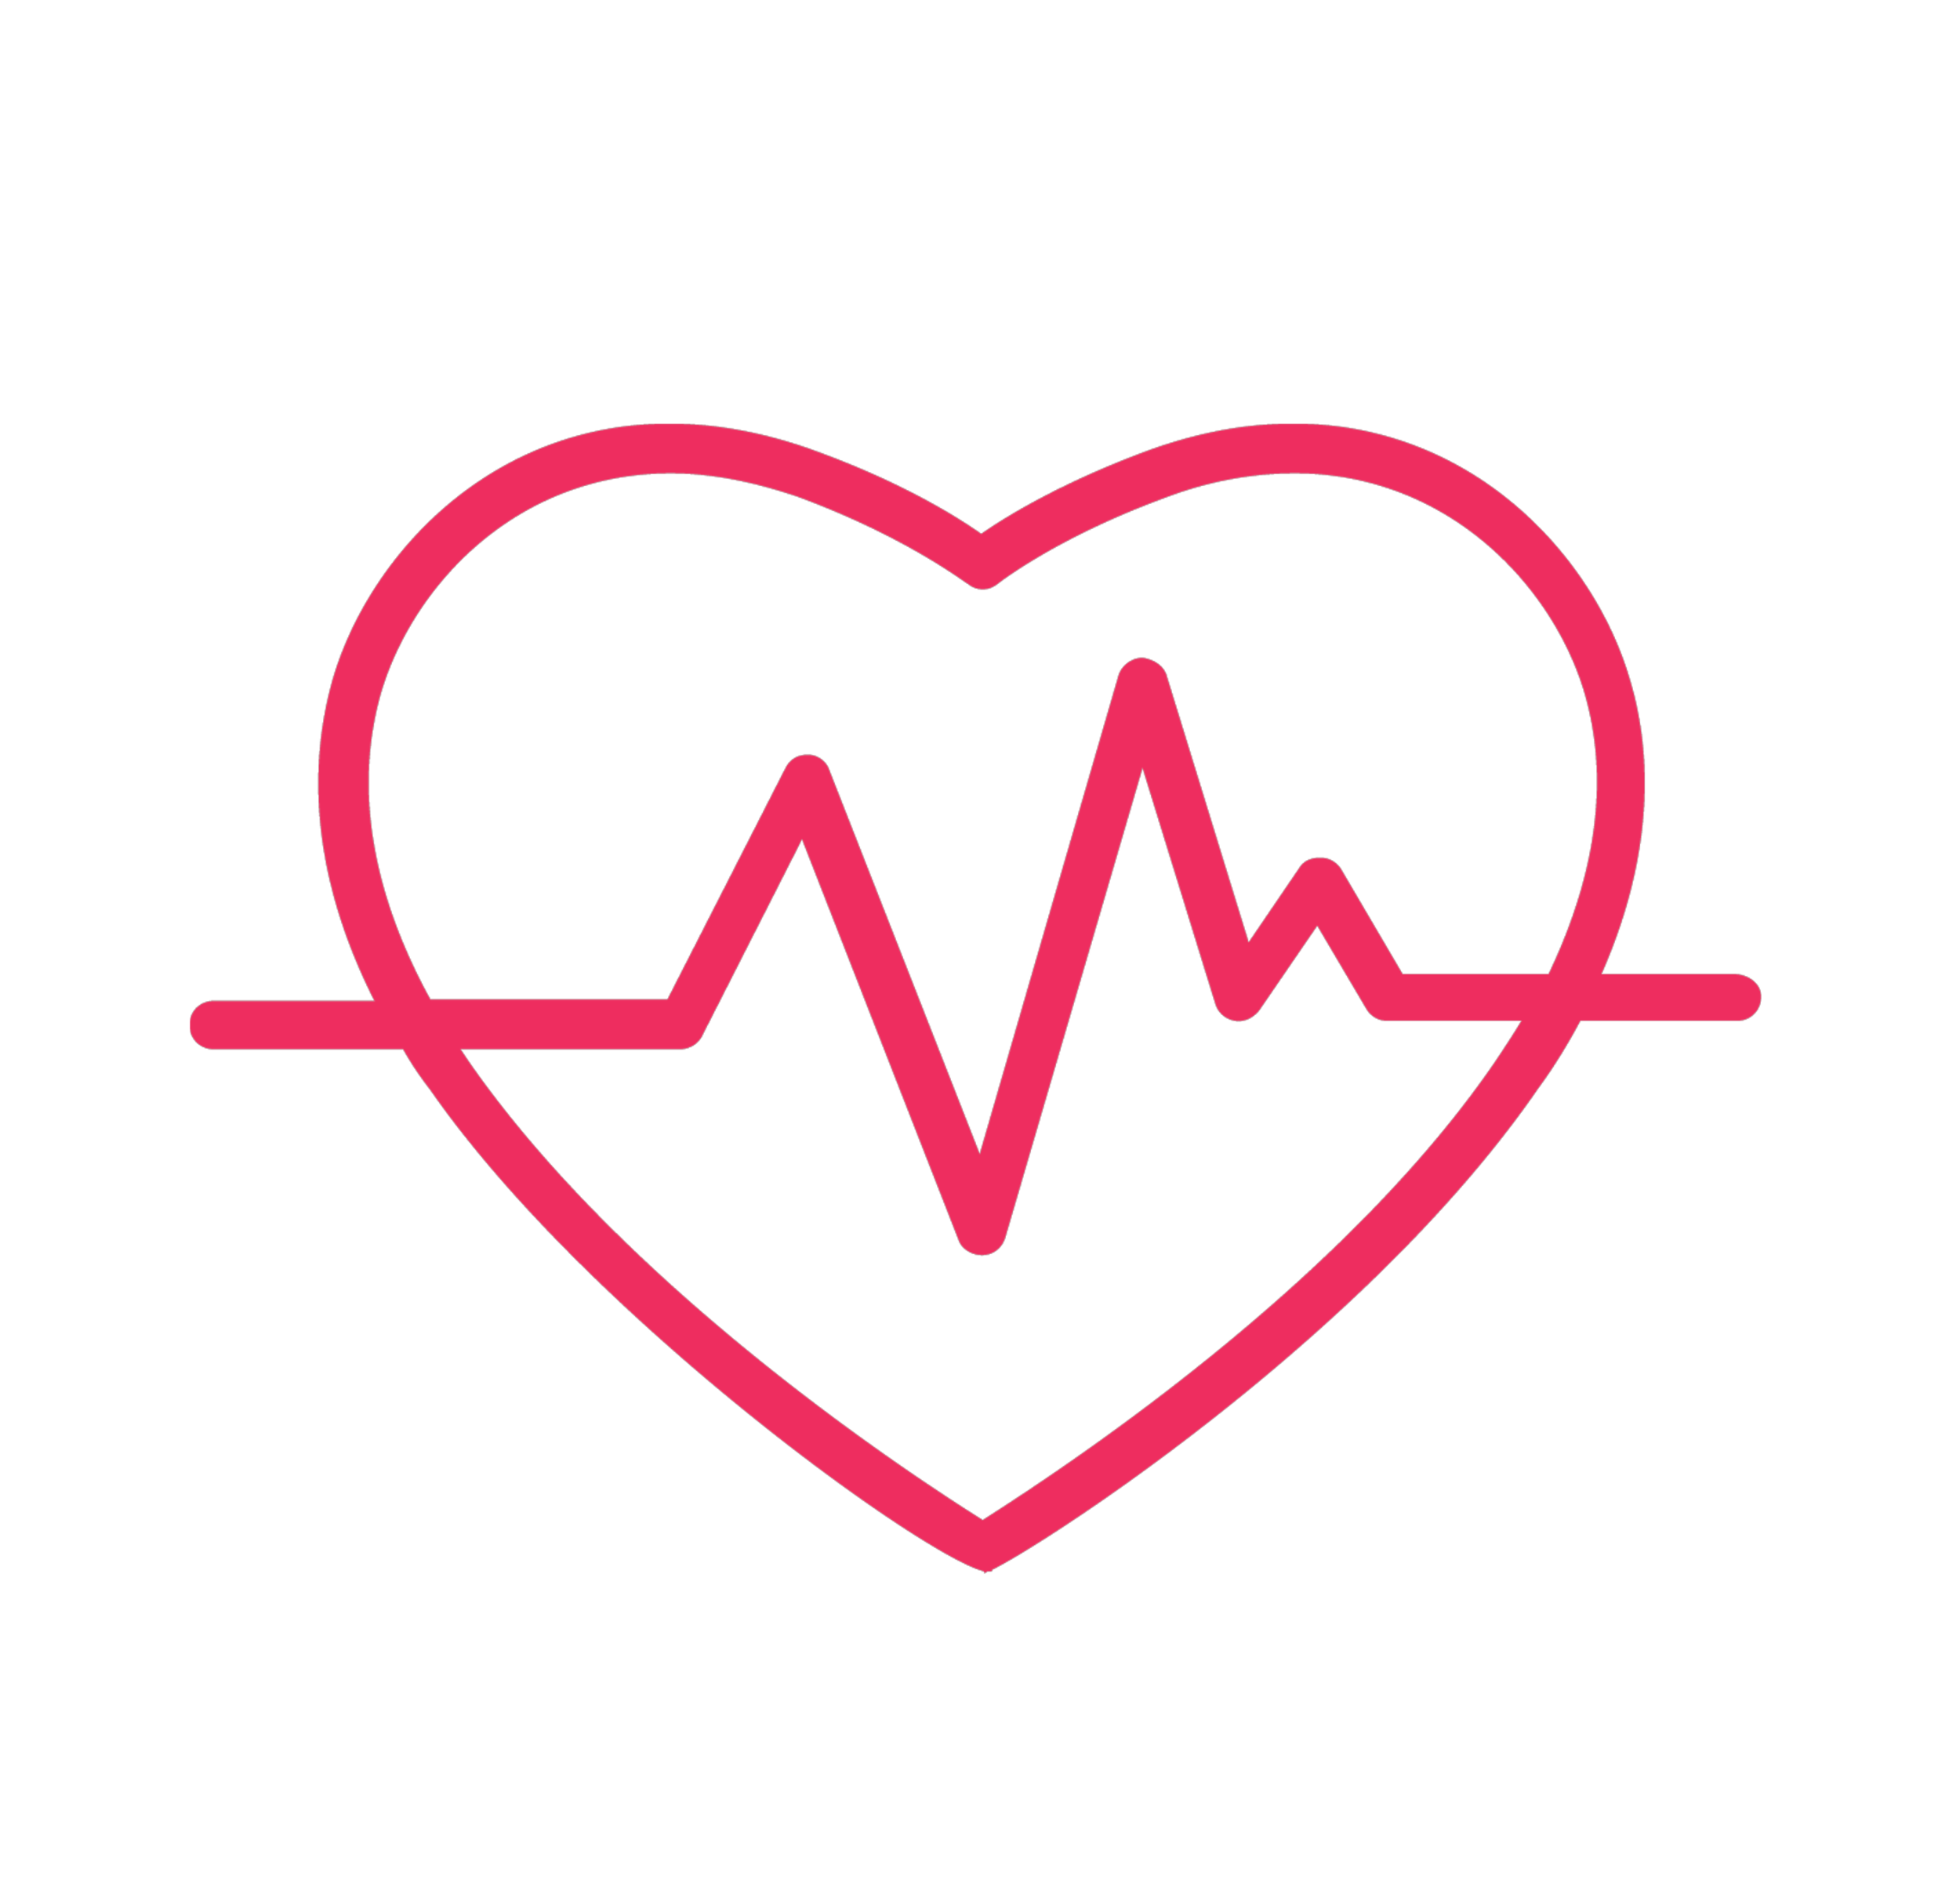 001-heart_transparent.png